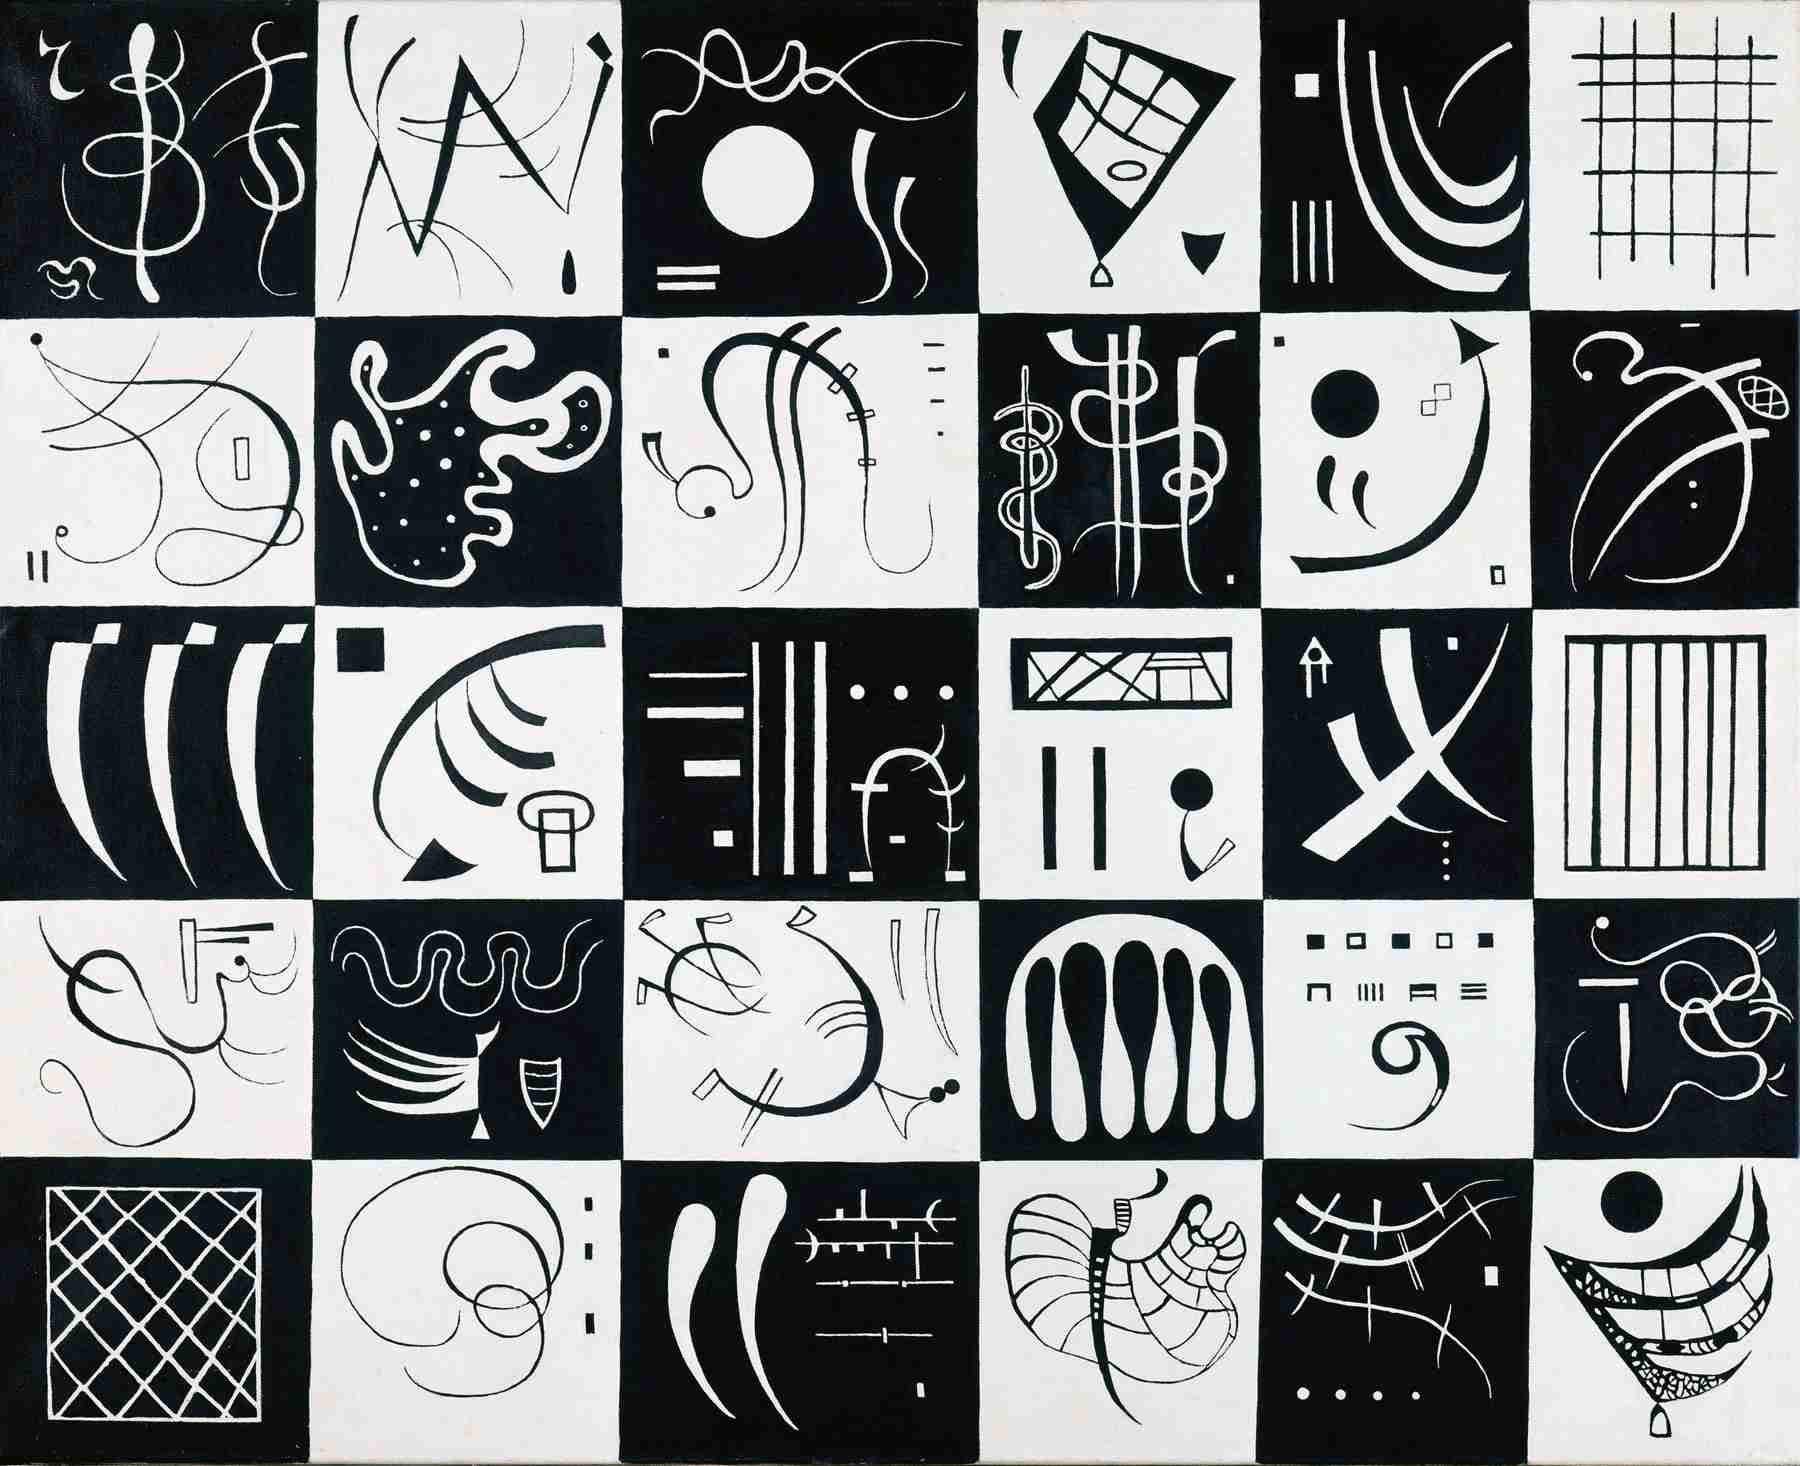 Wassily Kandinsky (Russian, 1866-1944) Wassily Kandinsky (Russian, 1866-1944). Thirty (Trente), 1937. Oil on canvas. 31 7/8 x 39 5/16 in. (81 x 100 cm). Gift of Nina Kandinsky, 1976. Musée national d'art moderne, Centre Pompidou, Paris.